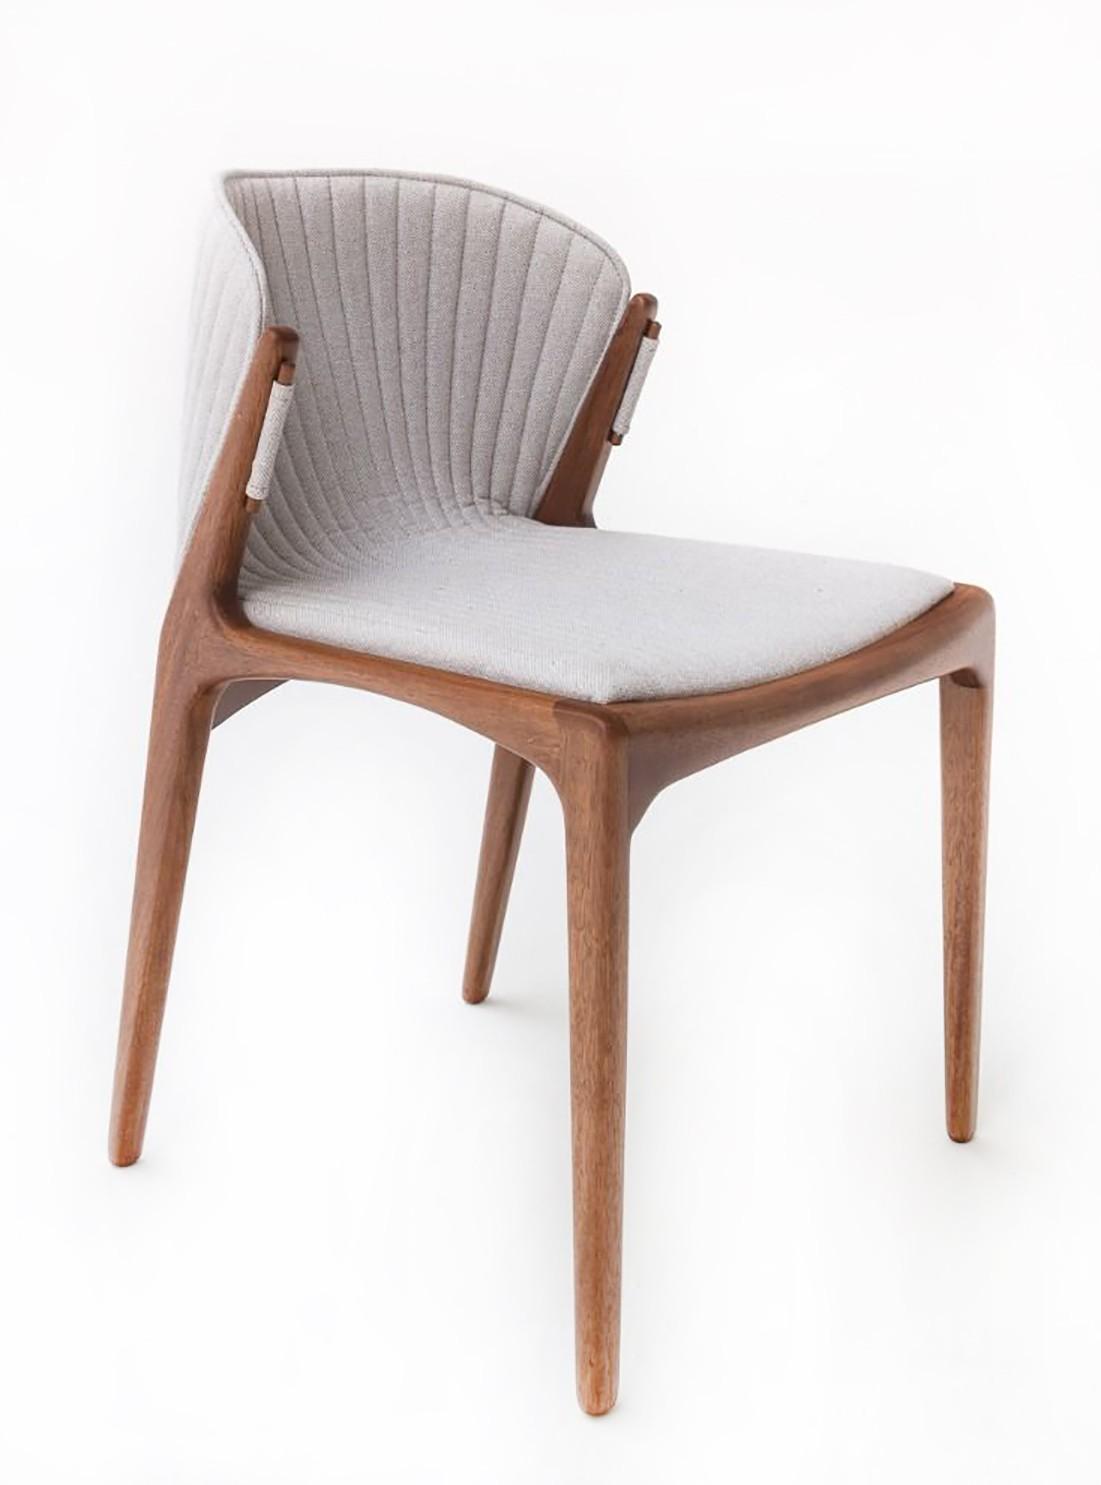 Cadeira Luisa · estudiobola